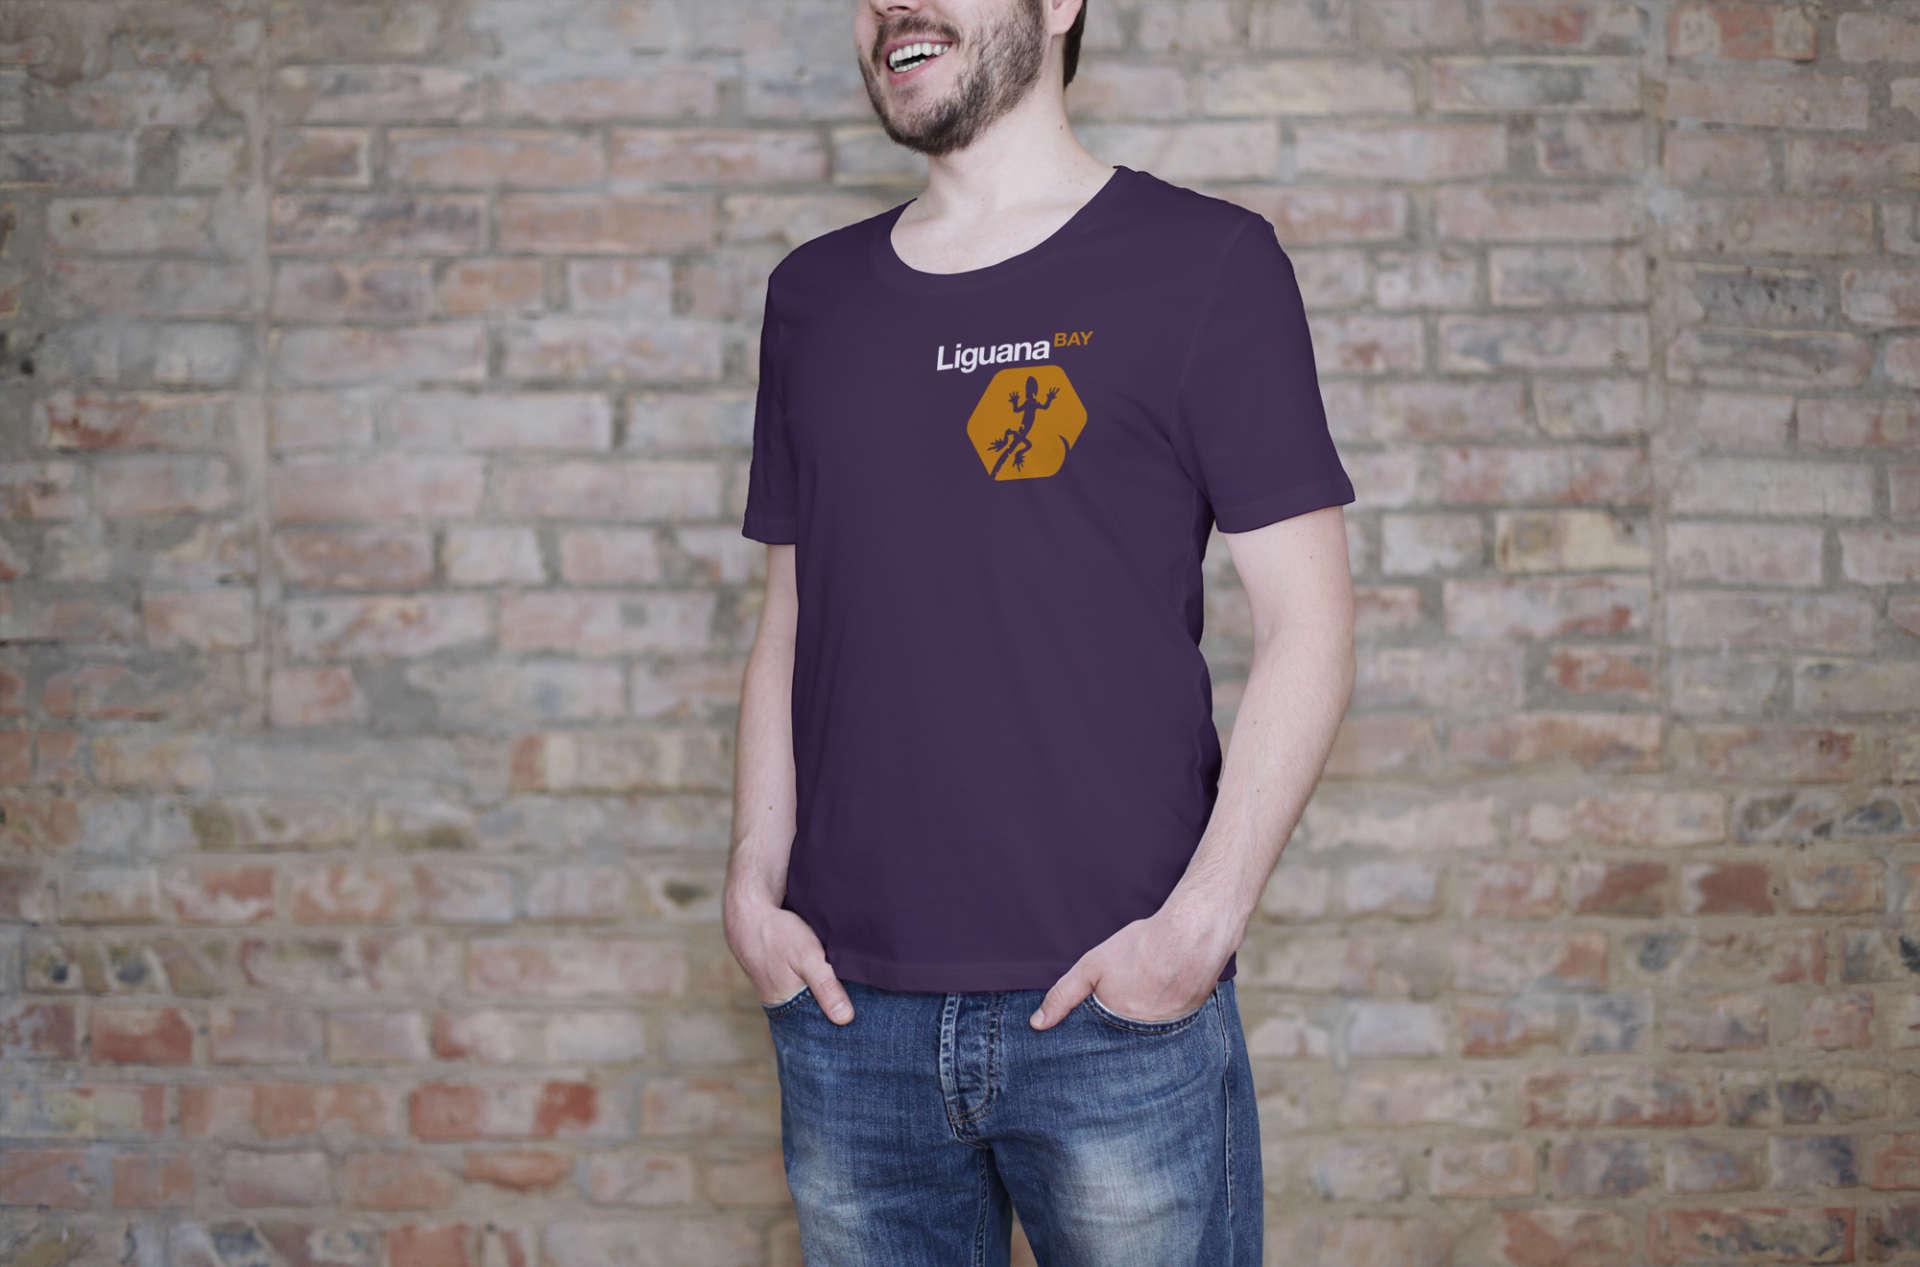 LiguanaBay-tshirt01